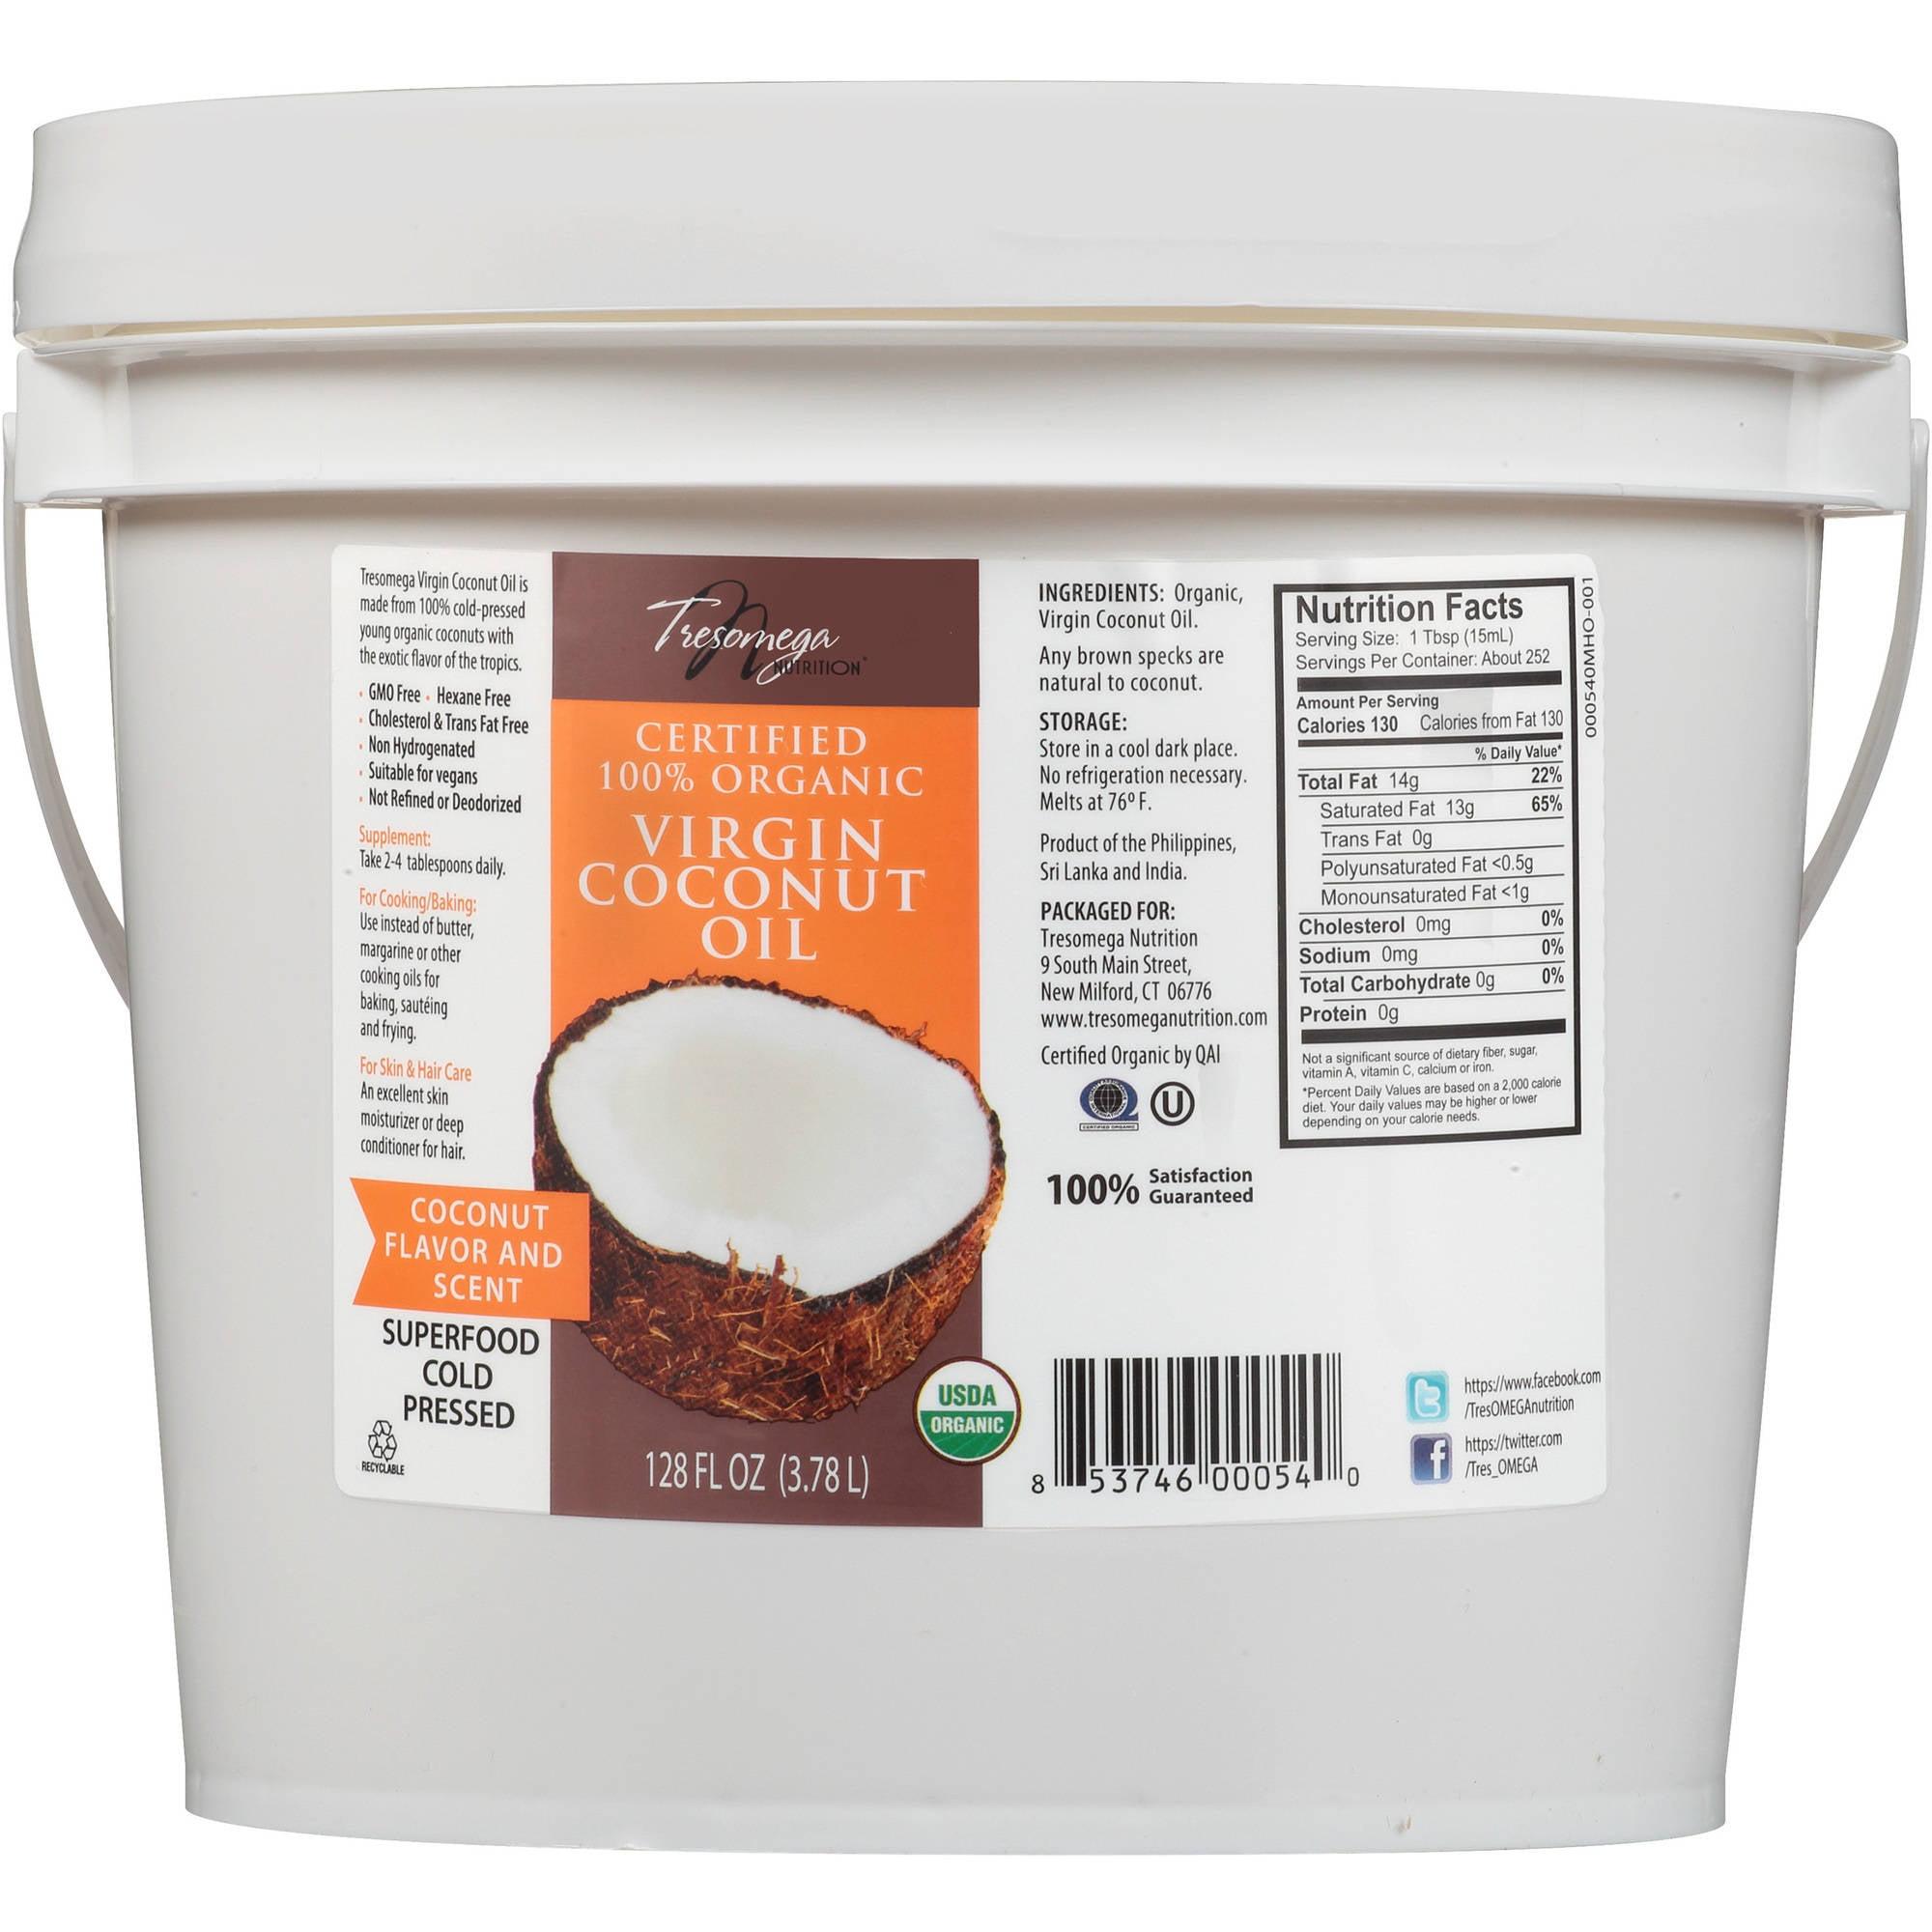 Tresomega Nutrition Certified 100% Organic Virgin Coconut Oil, 128 fl oz